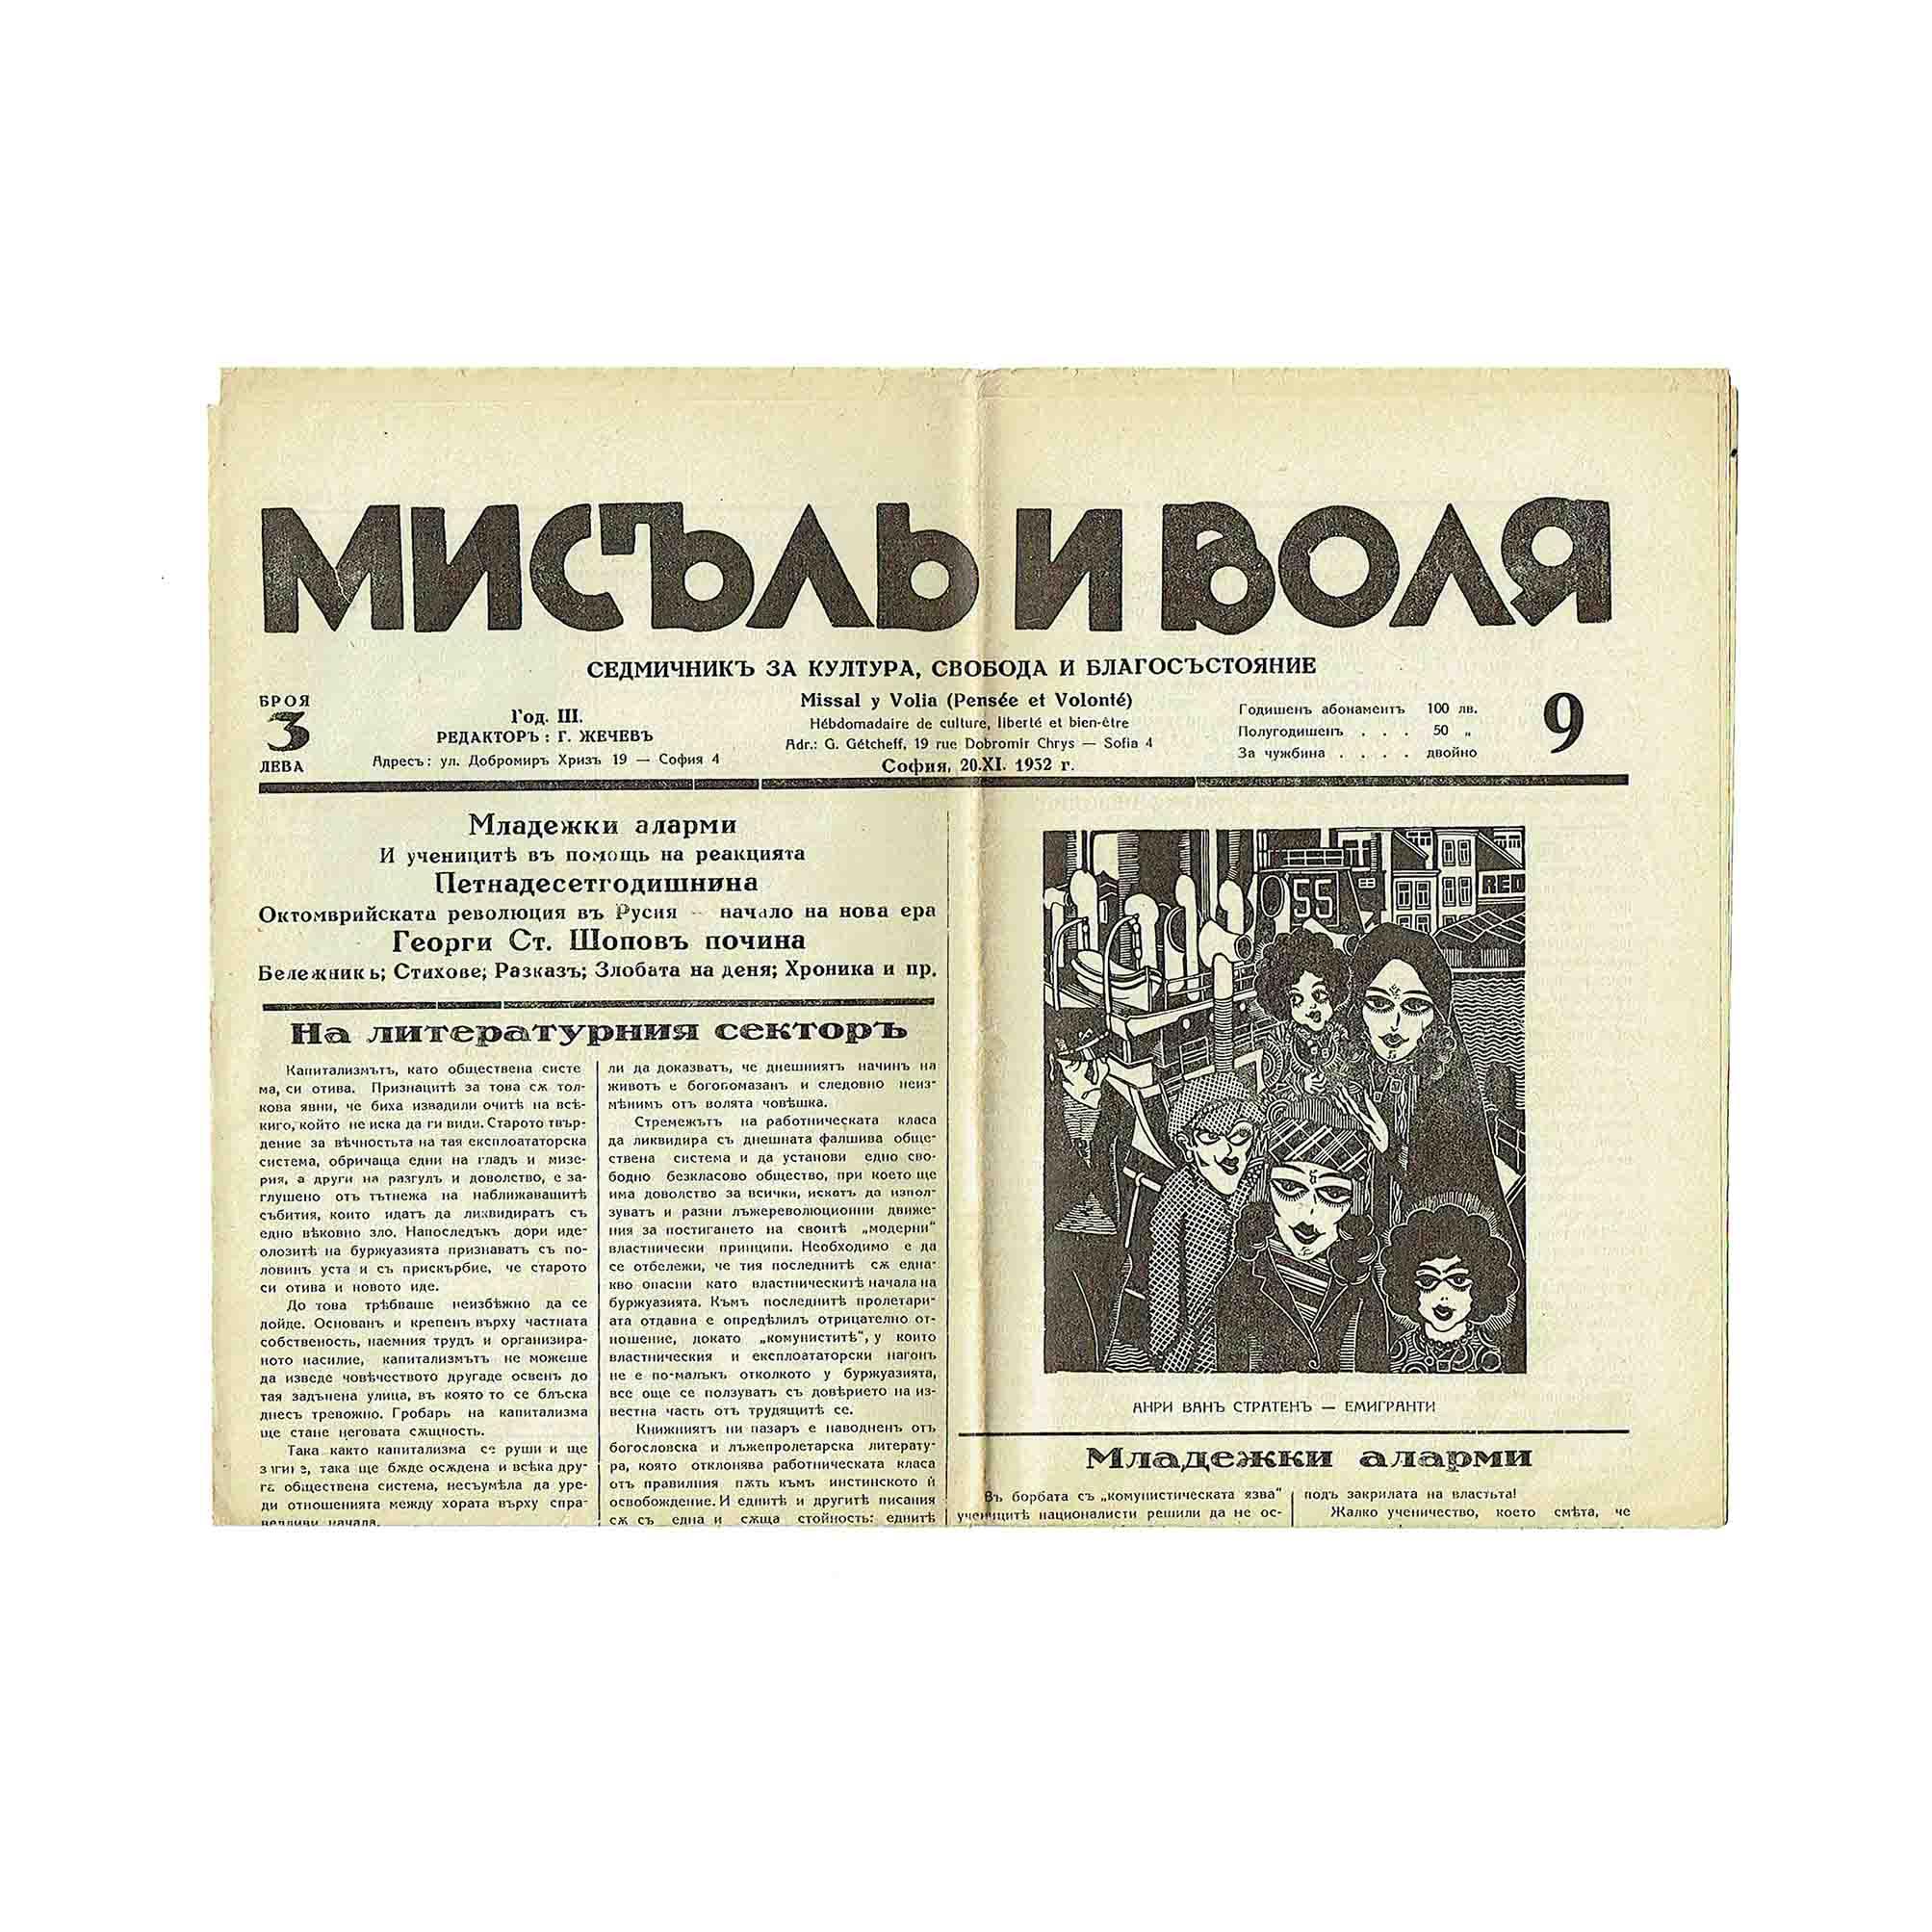 5847-Misal-i-Volya-Gedanke-und-Wille-III-9-1930-Titelblatt-A-N.jpeg